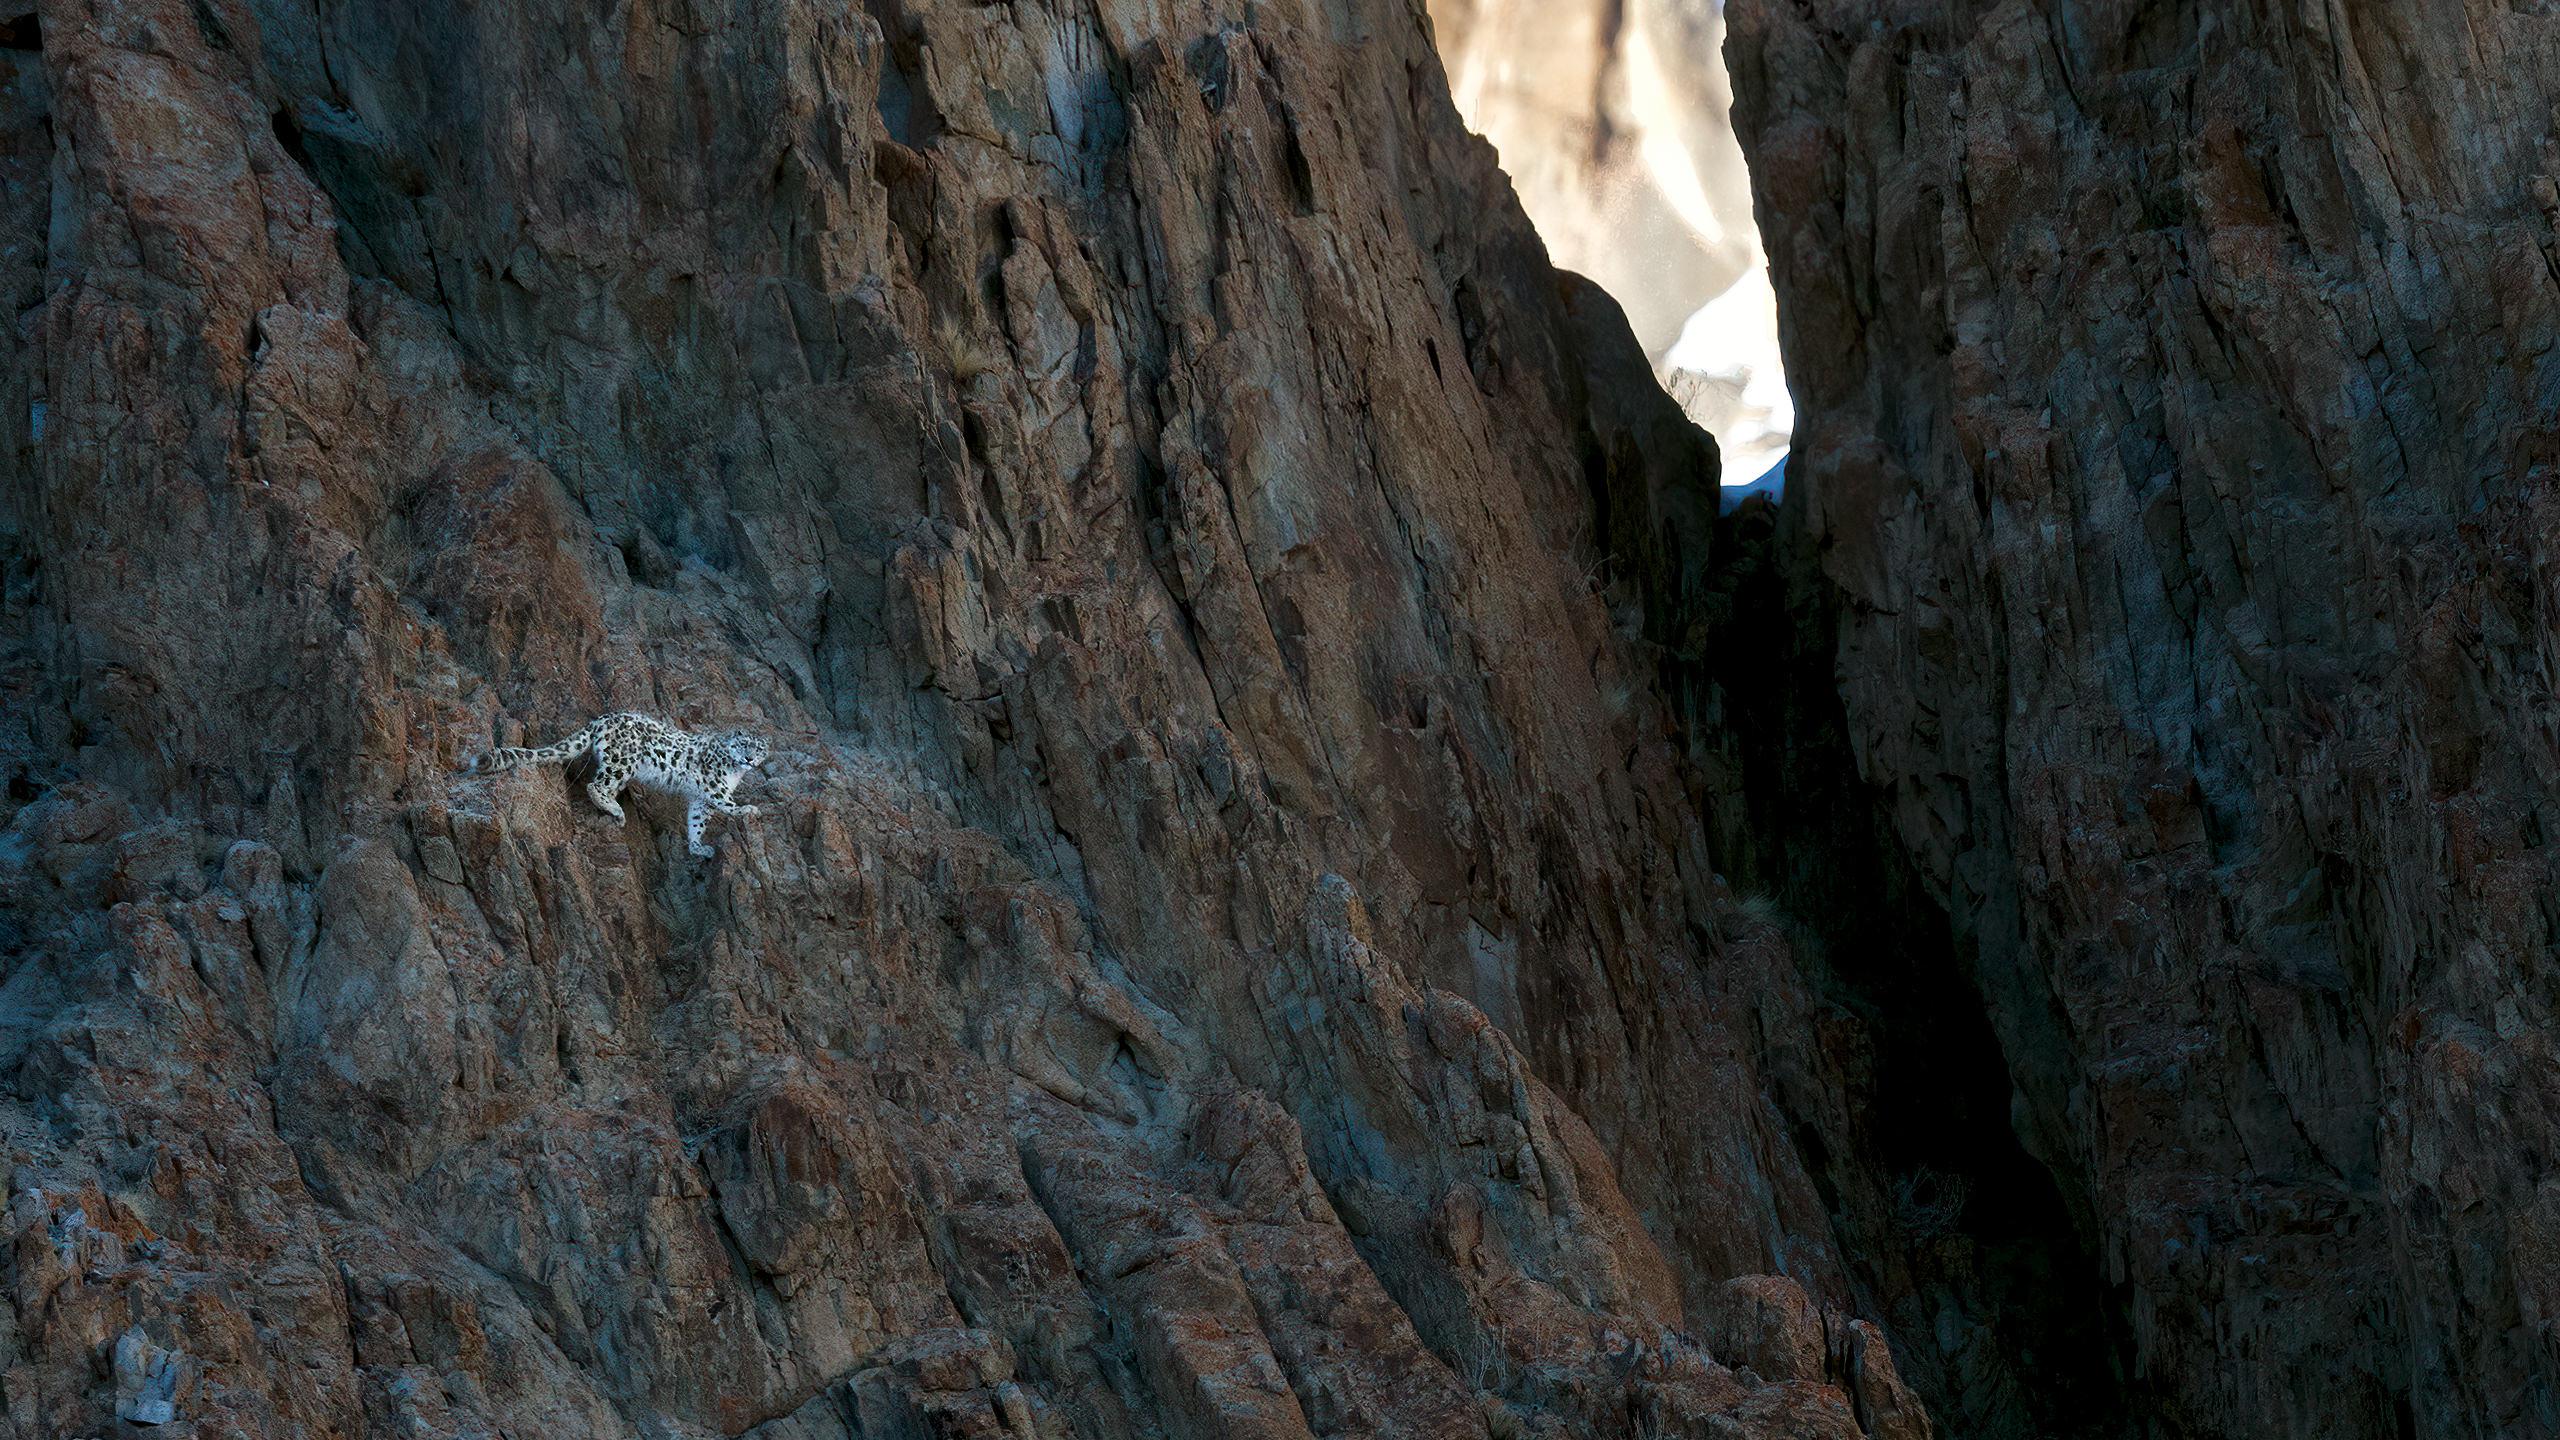 Snow Leopard Ladakh Himalaya by Arindam Bhattacharya